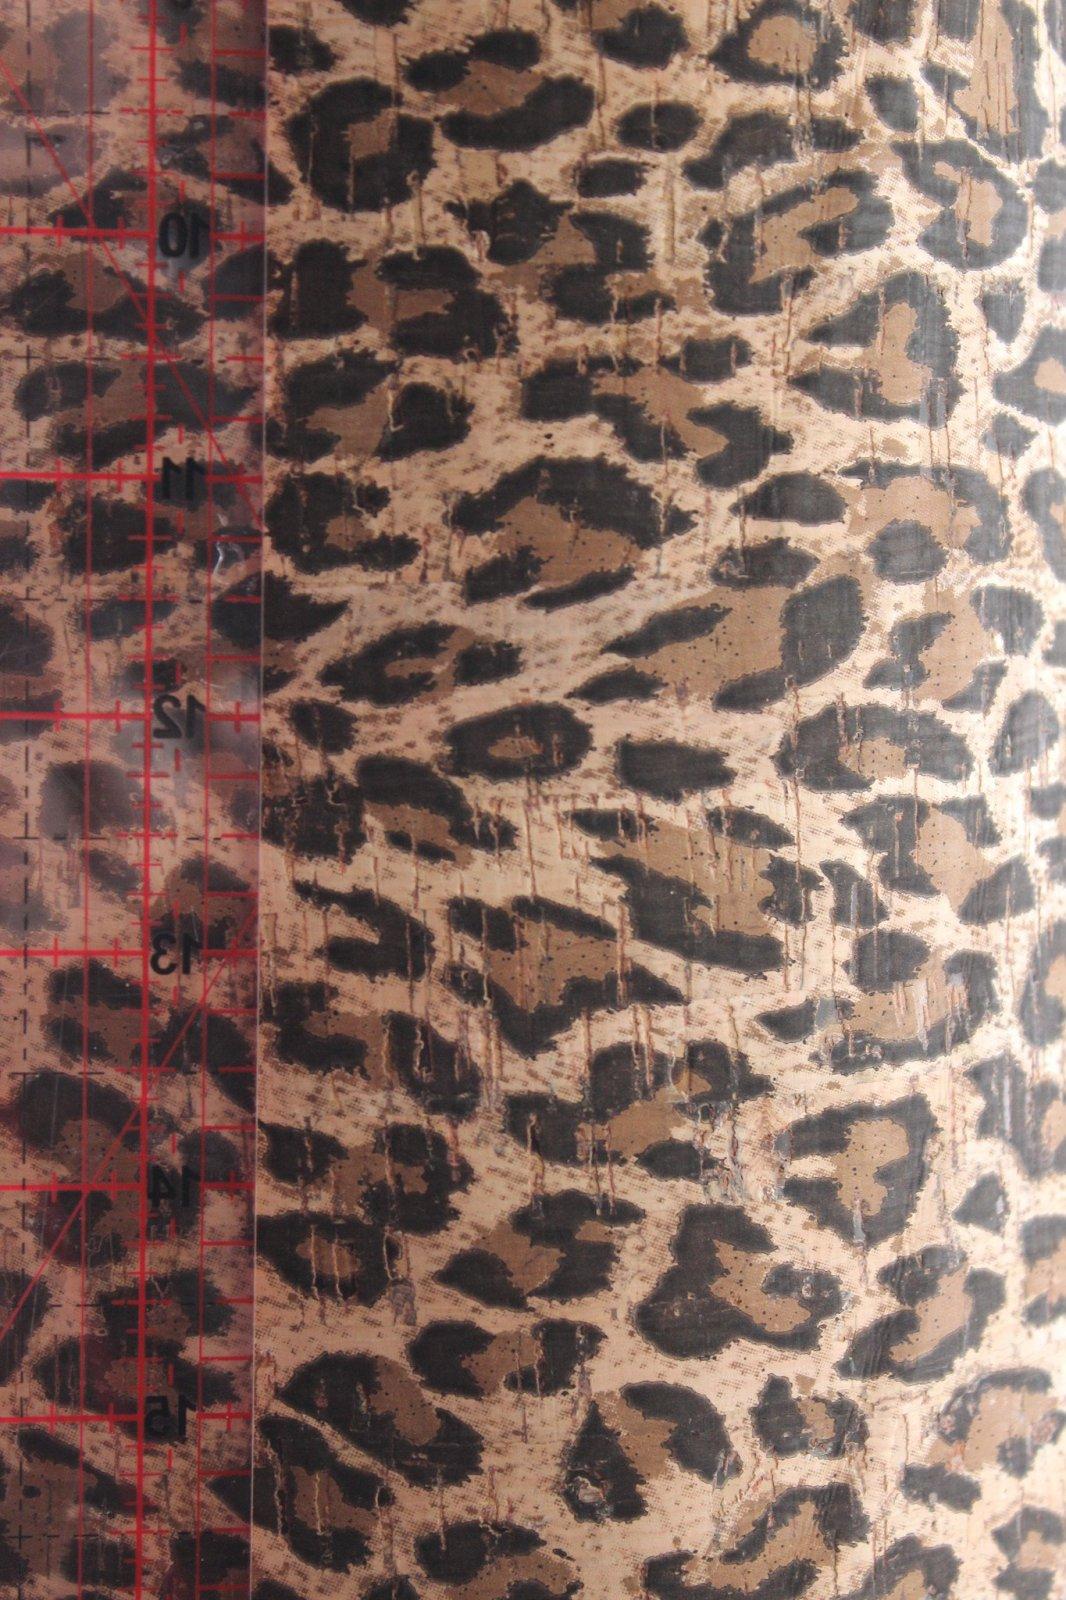 Printed Leopard Cork Fabric (36x36)